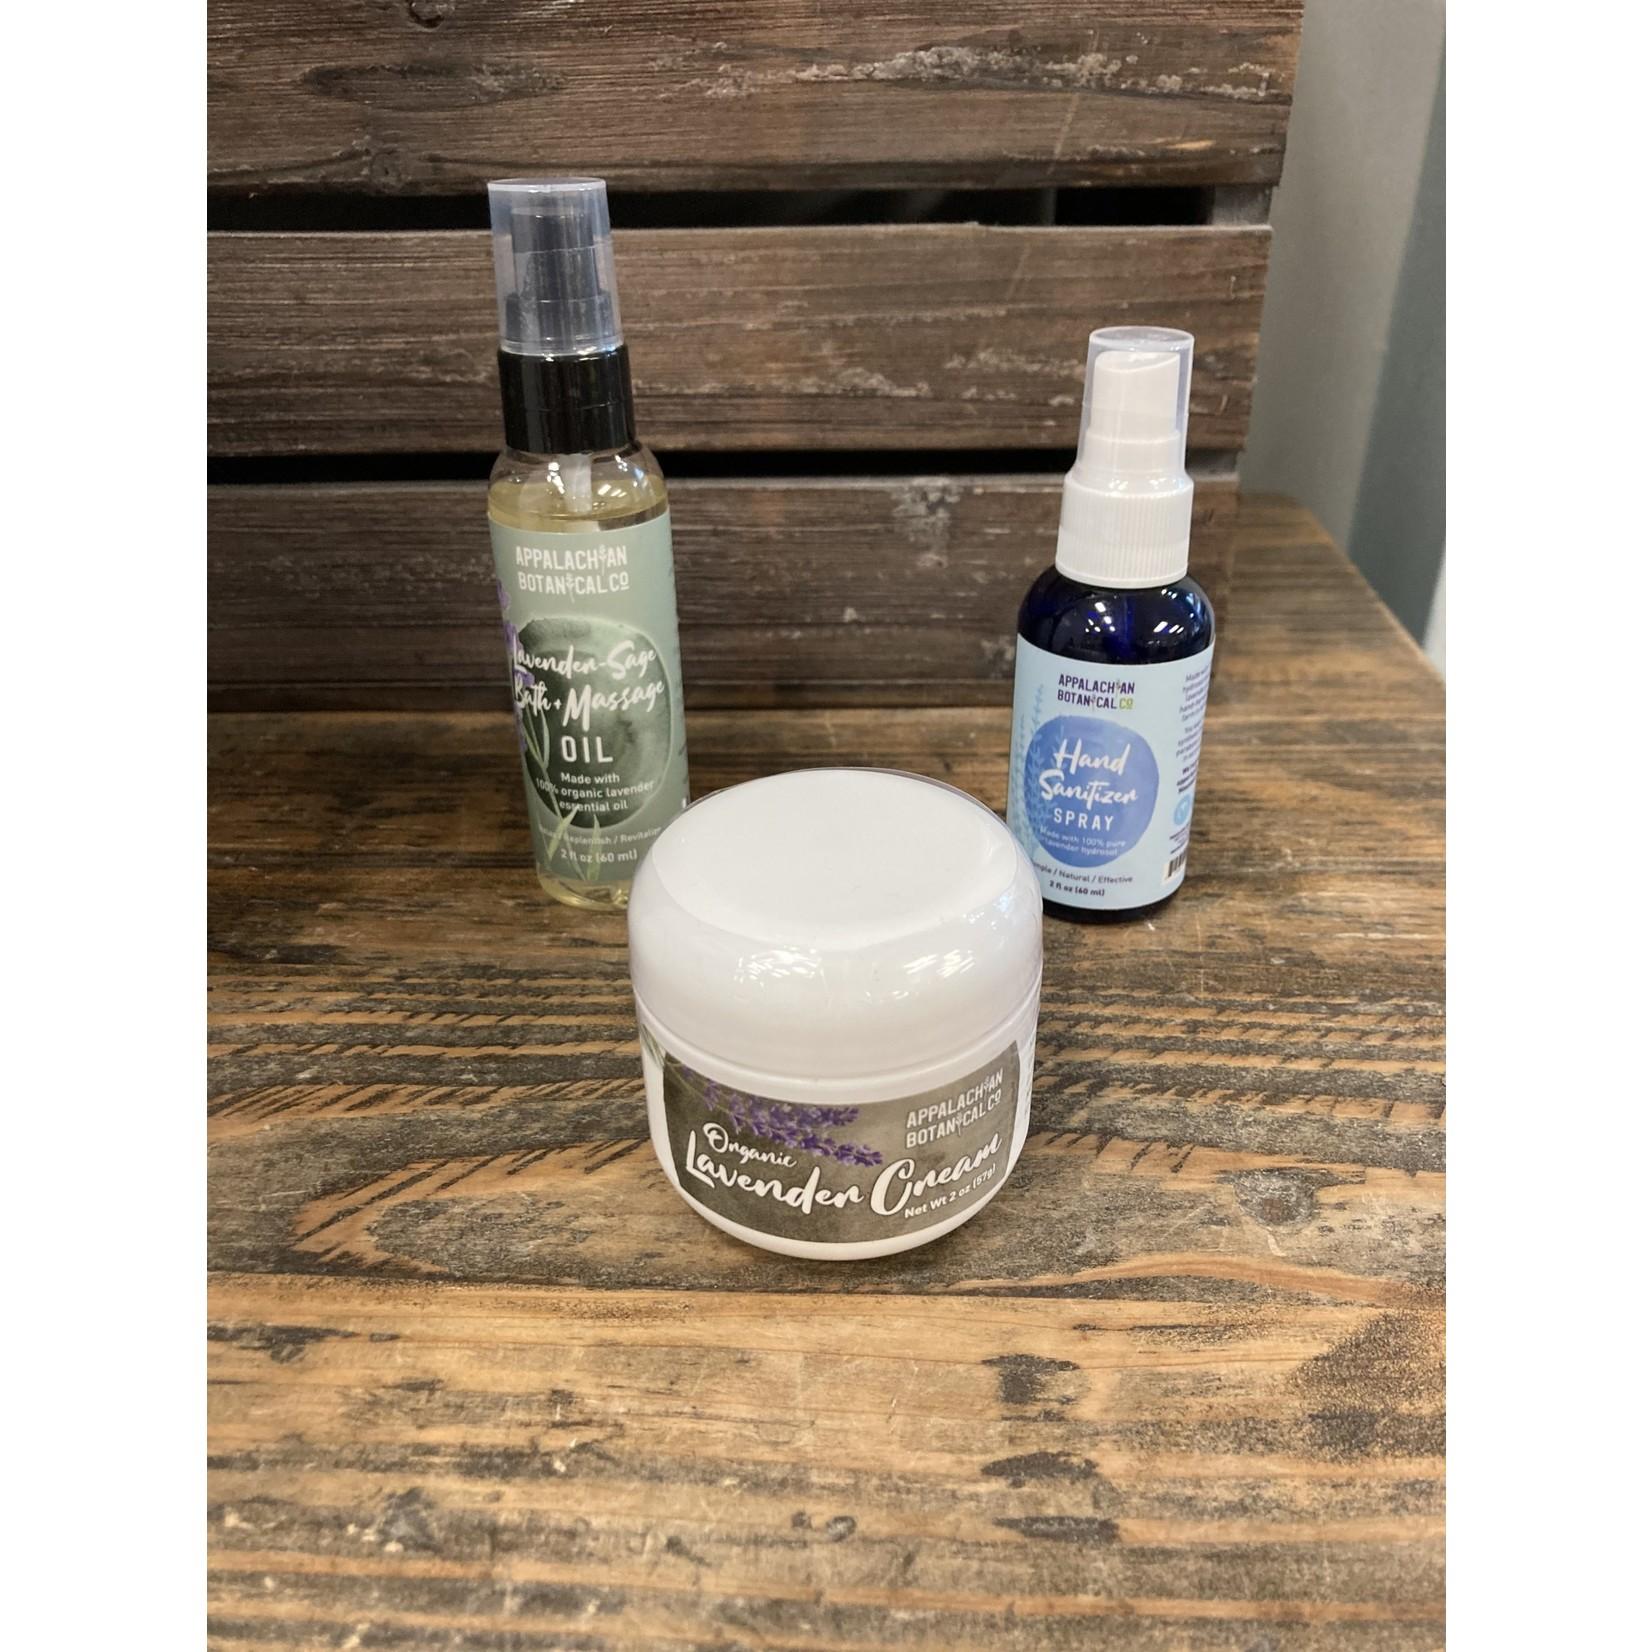 Appalachian Botanical Co. Appalachian Botanical Co. l Lavender Hand Sanitizer Spray 2oz.